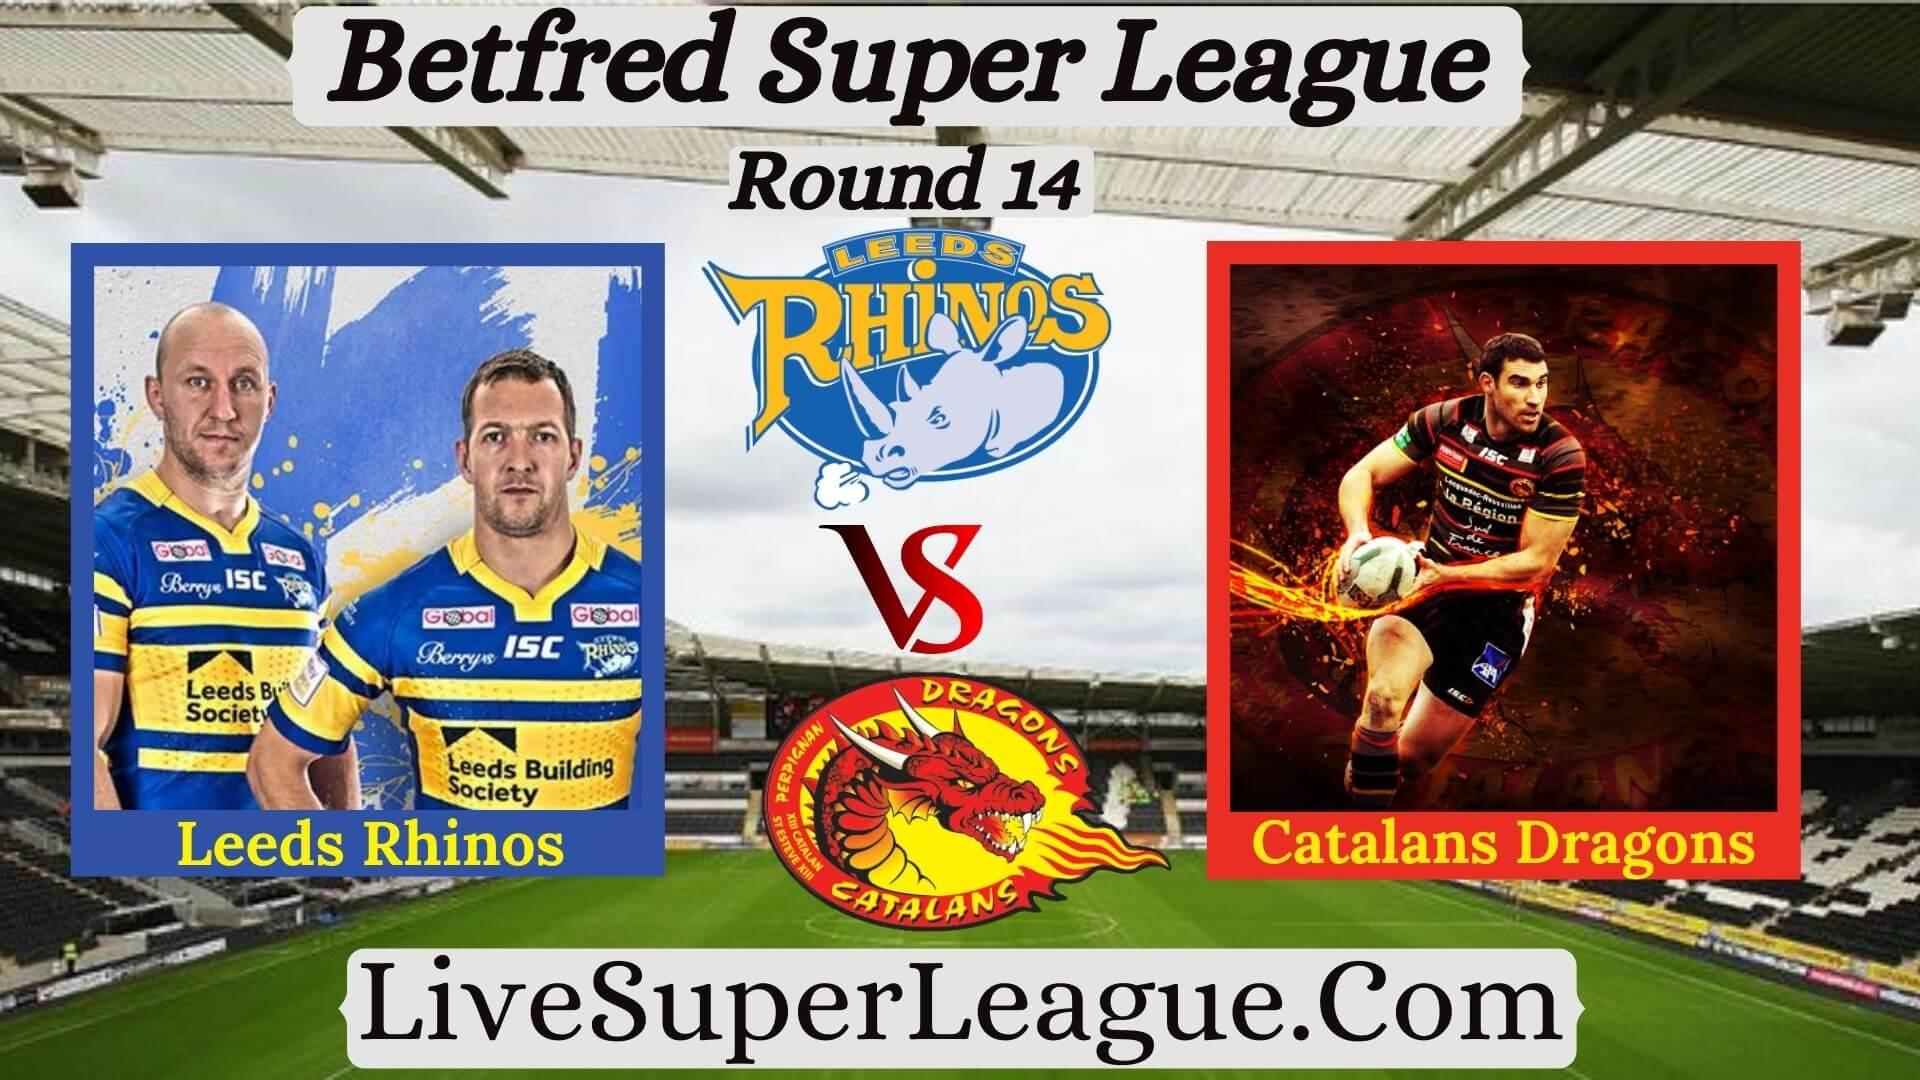 Leeds Rhinos Vs Catalans Dragons Rd 14 Live Stream 2020 | Full Match Replay